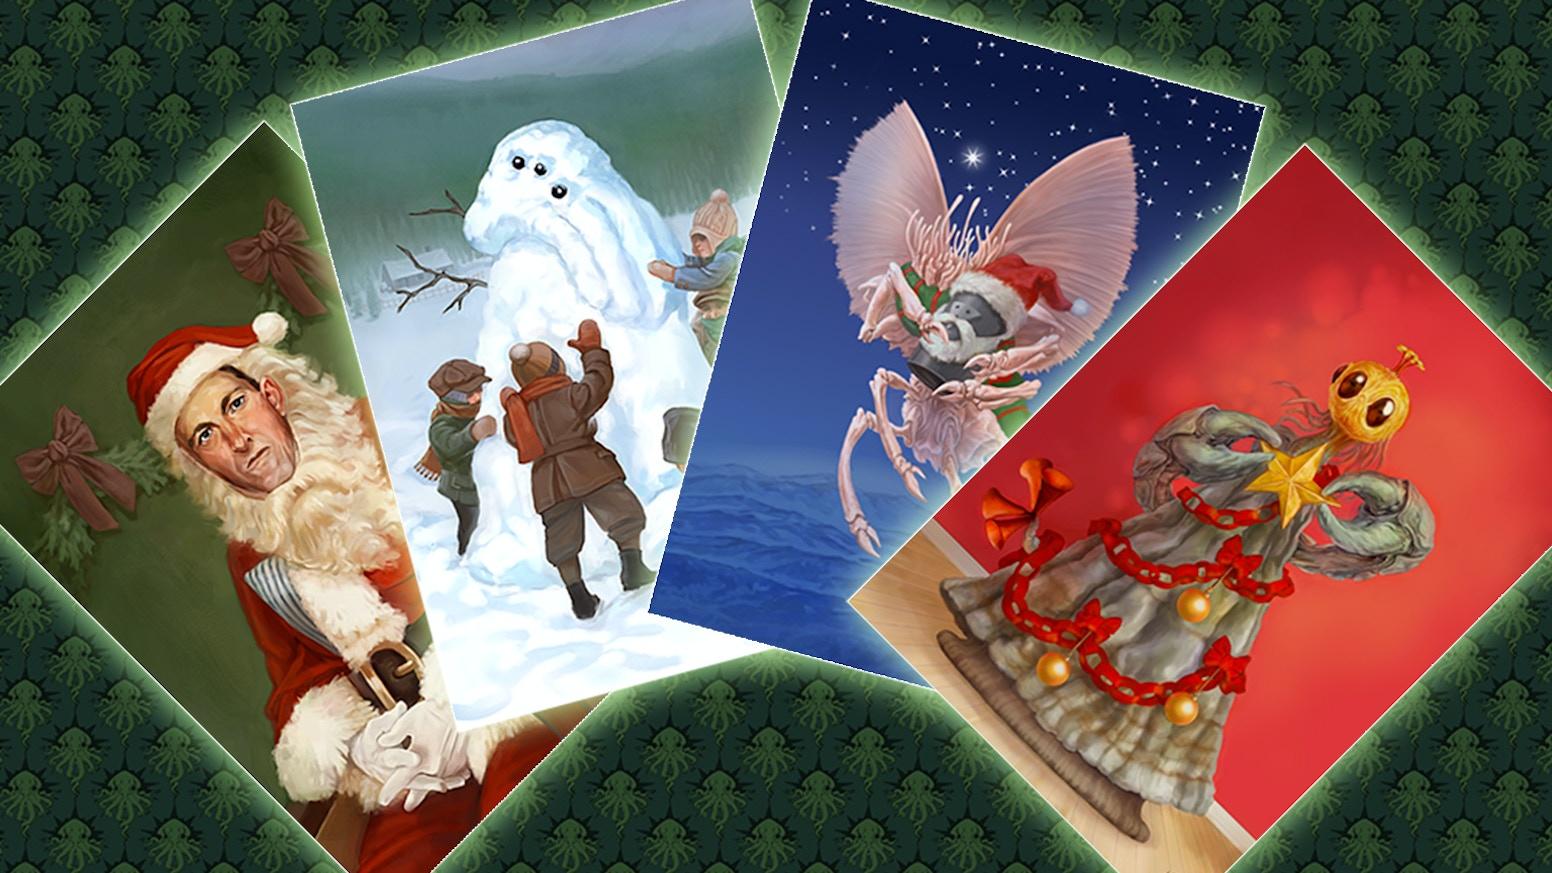 Cthulhu Christmas Greeting Cards by Studio WonderCabinet — Kickstarter